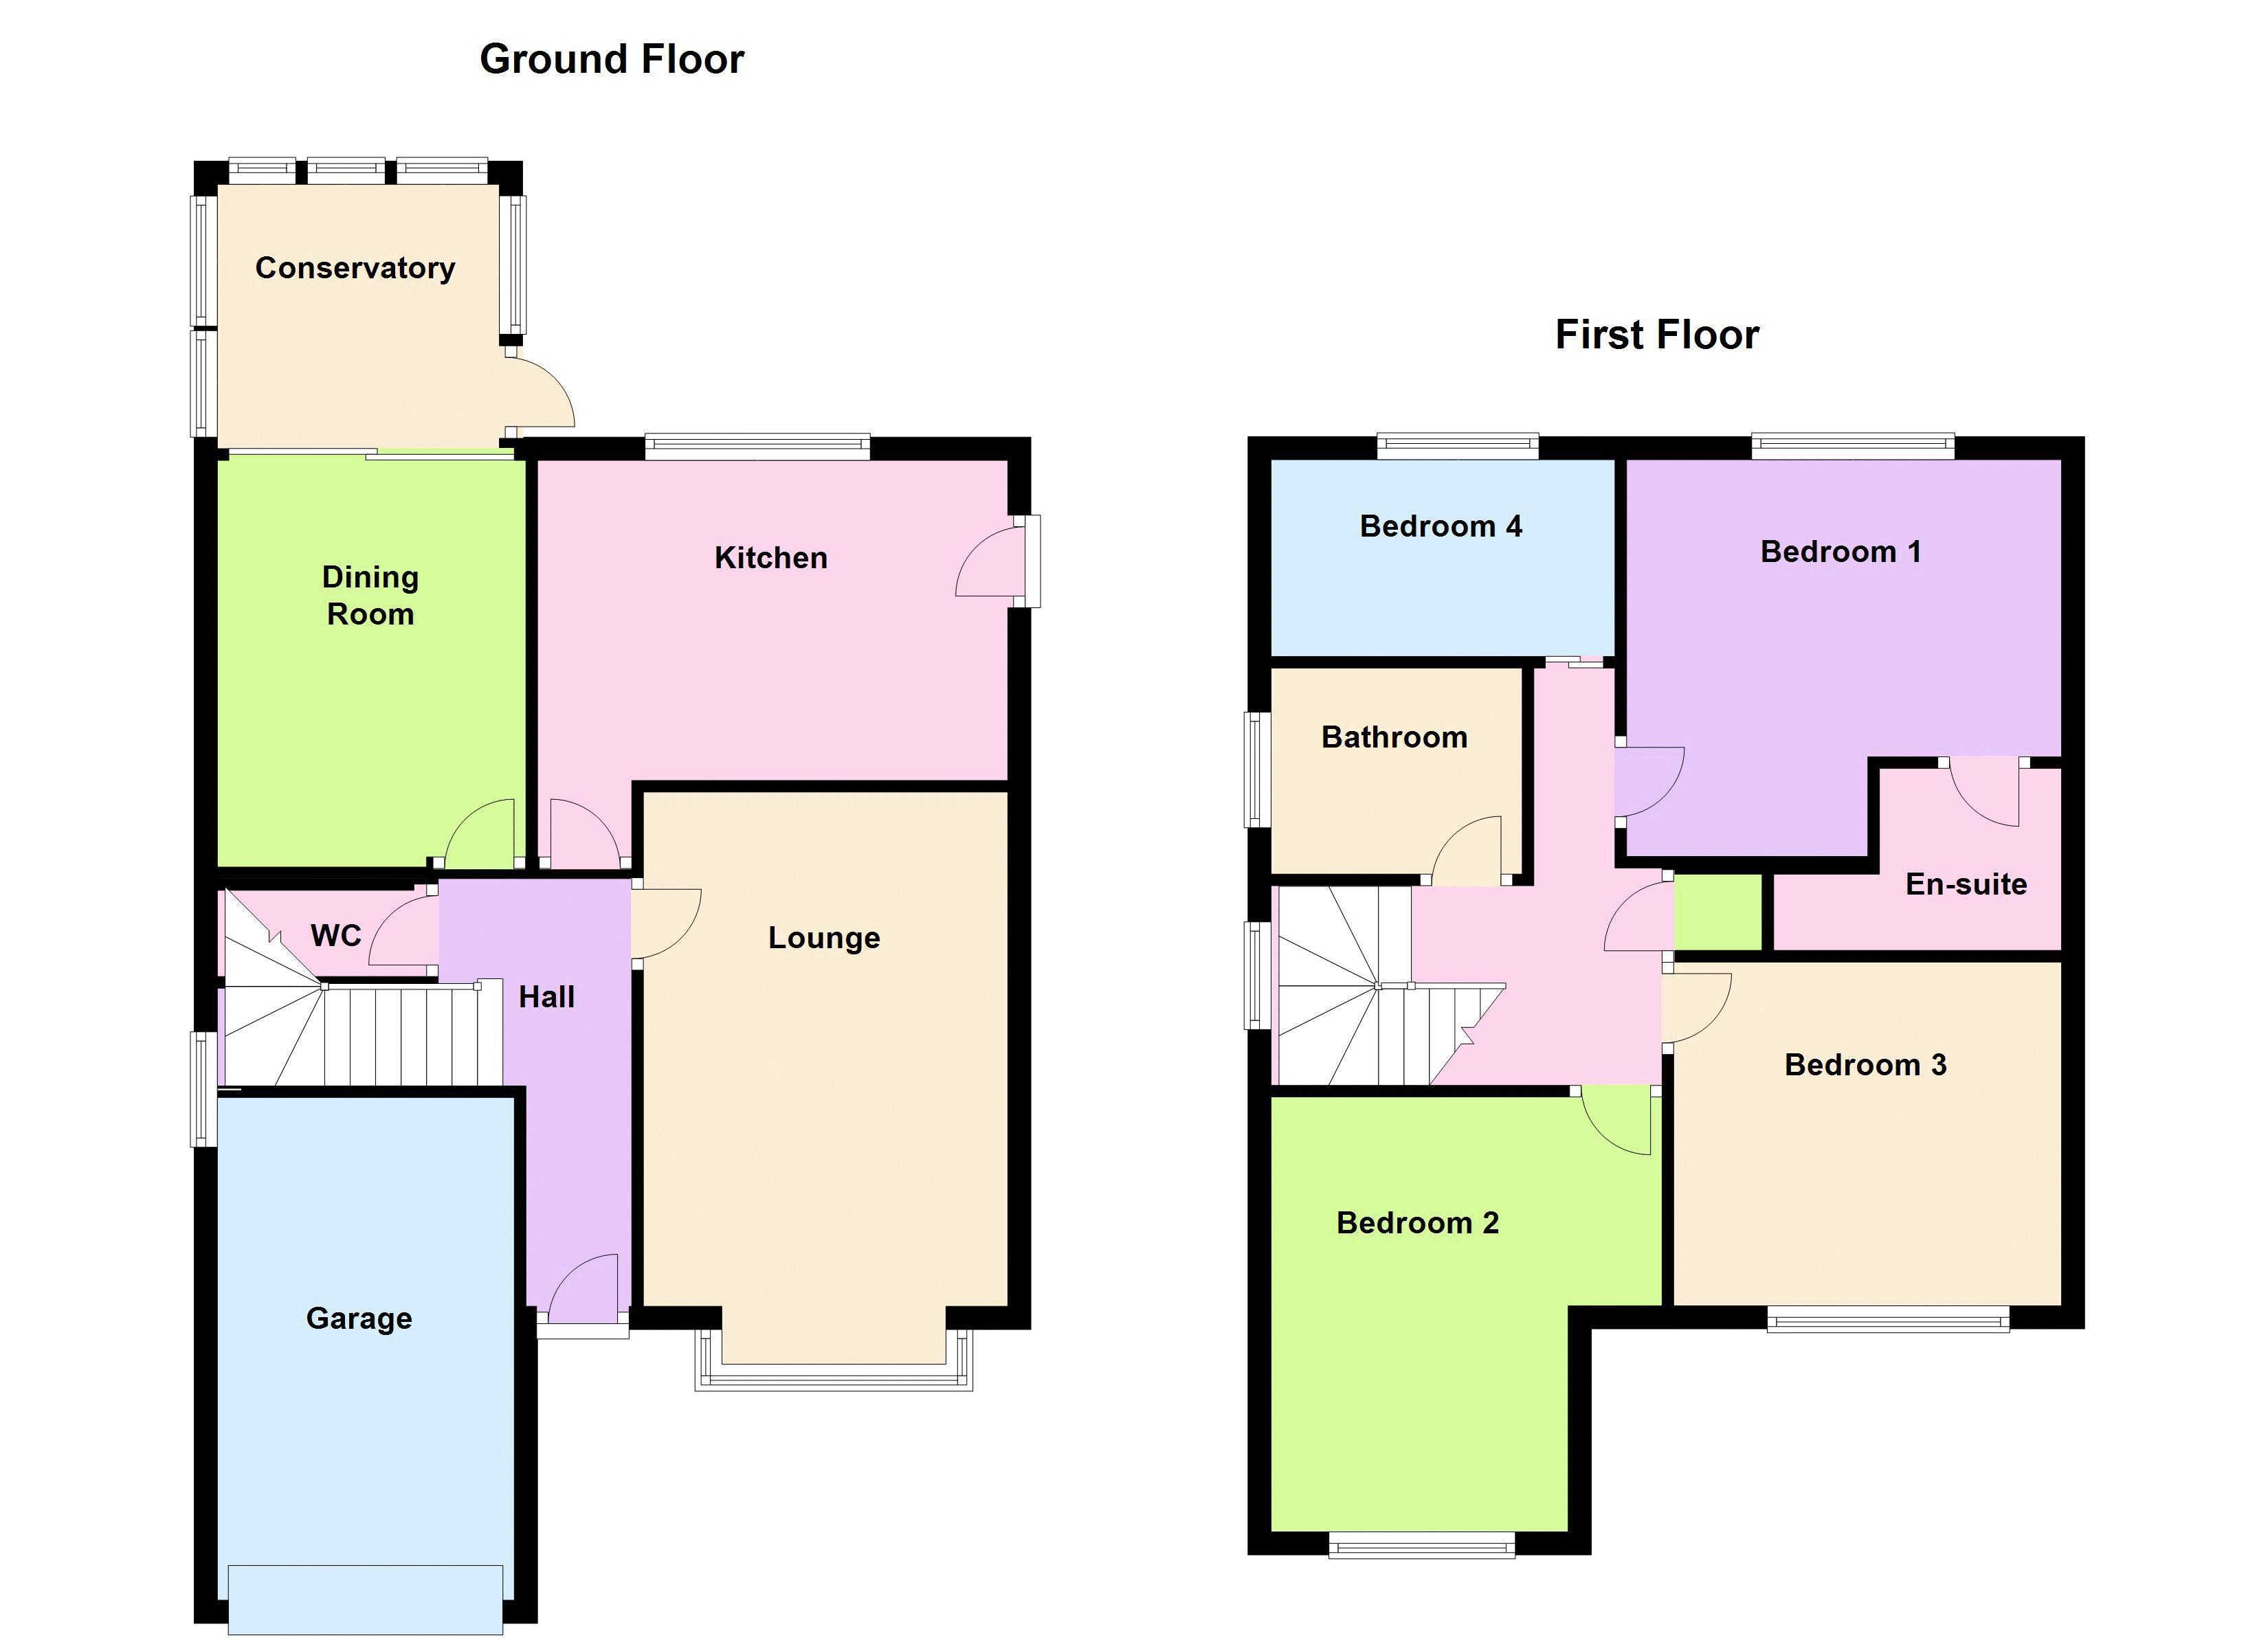 Shop Checkolite International 4 Light Ashfield Rustic: Grendon Way, Sutton-In-Ashfield NG17, 4 Bedroom Detached